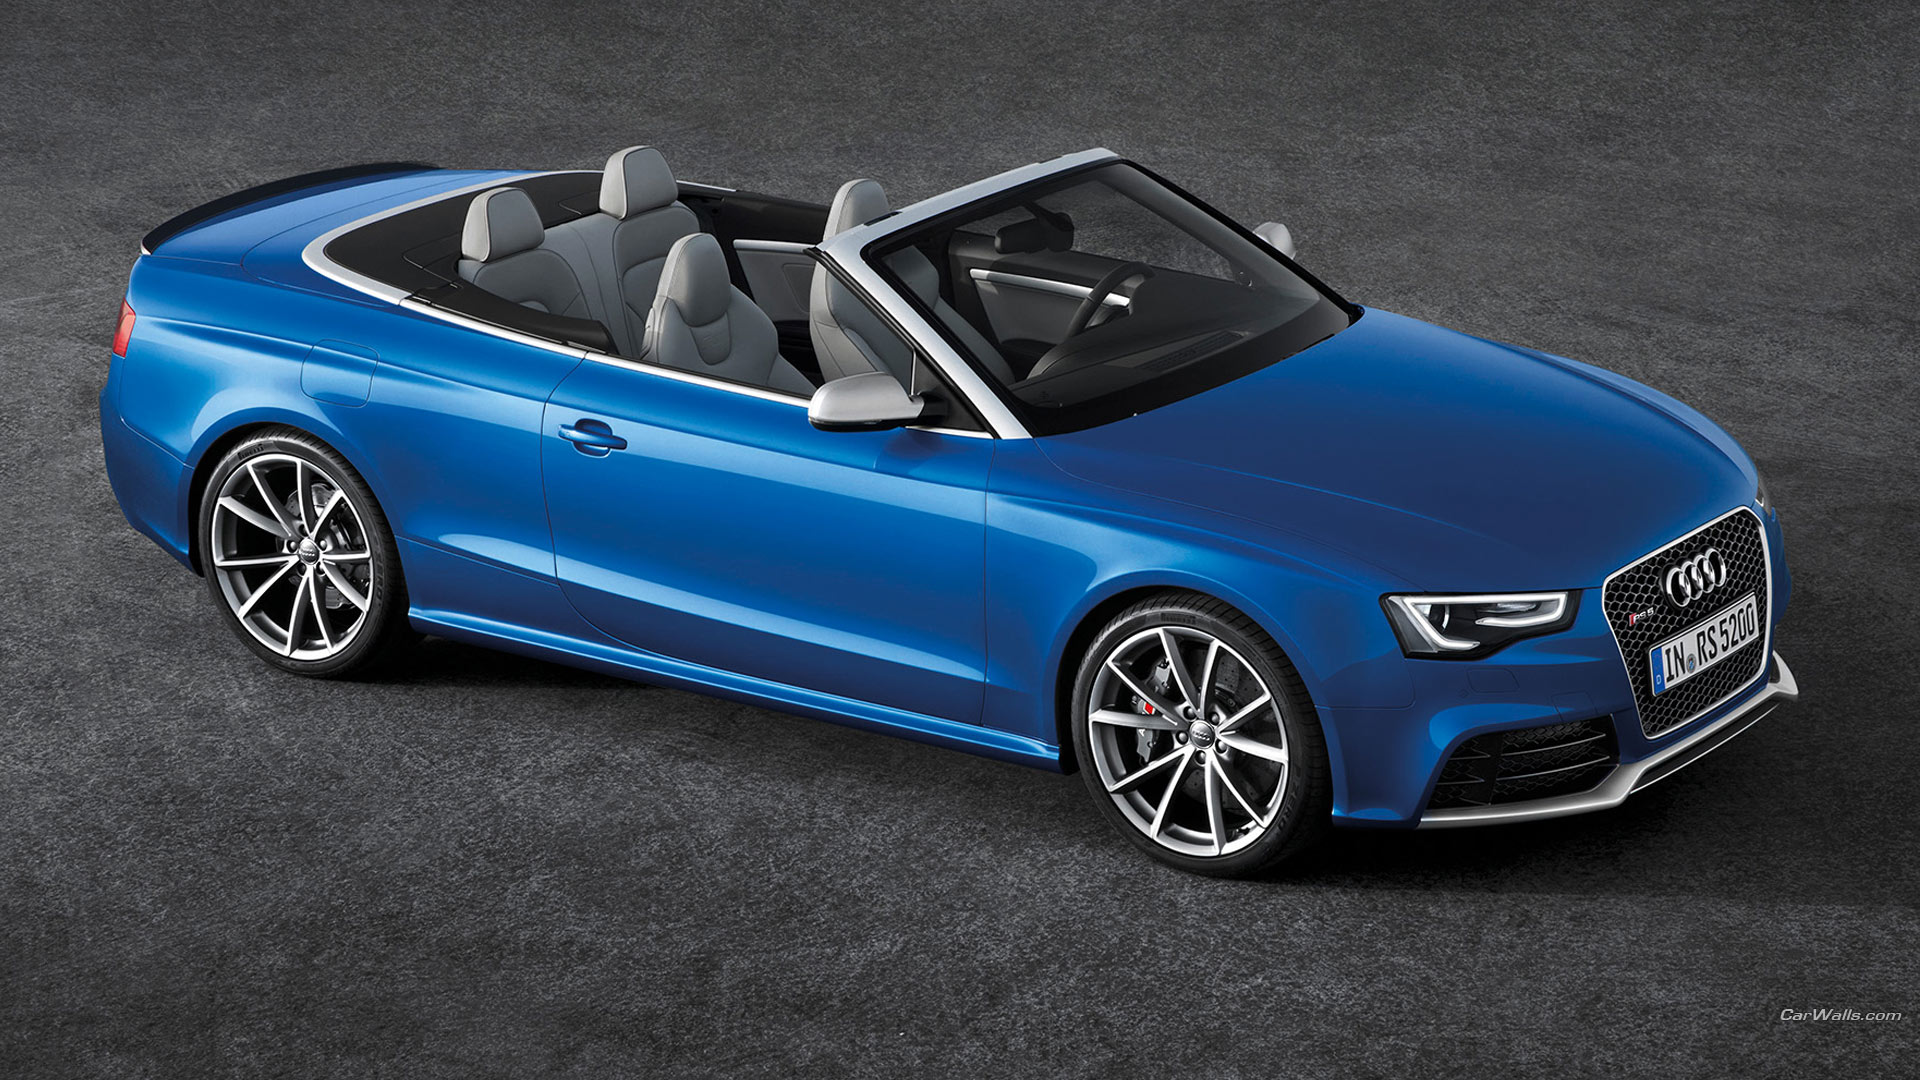 Audi Wallpaper 4k Ultra Picture Download Free Hd